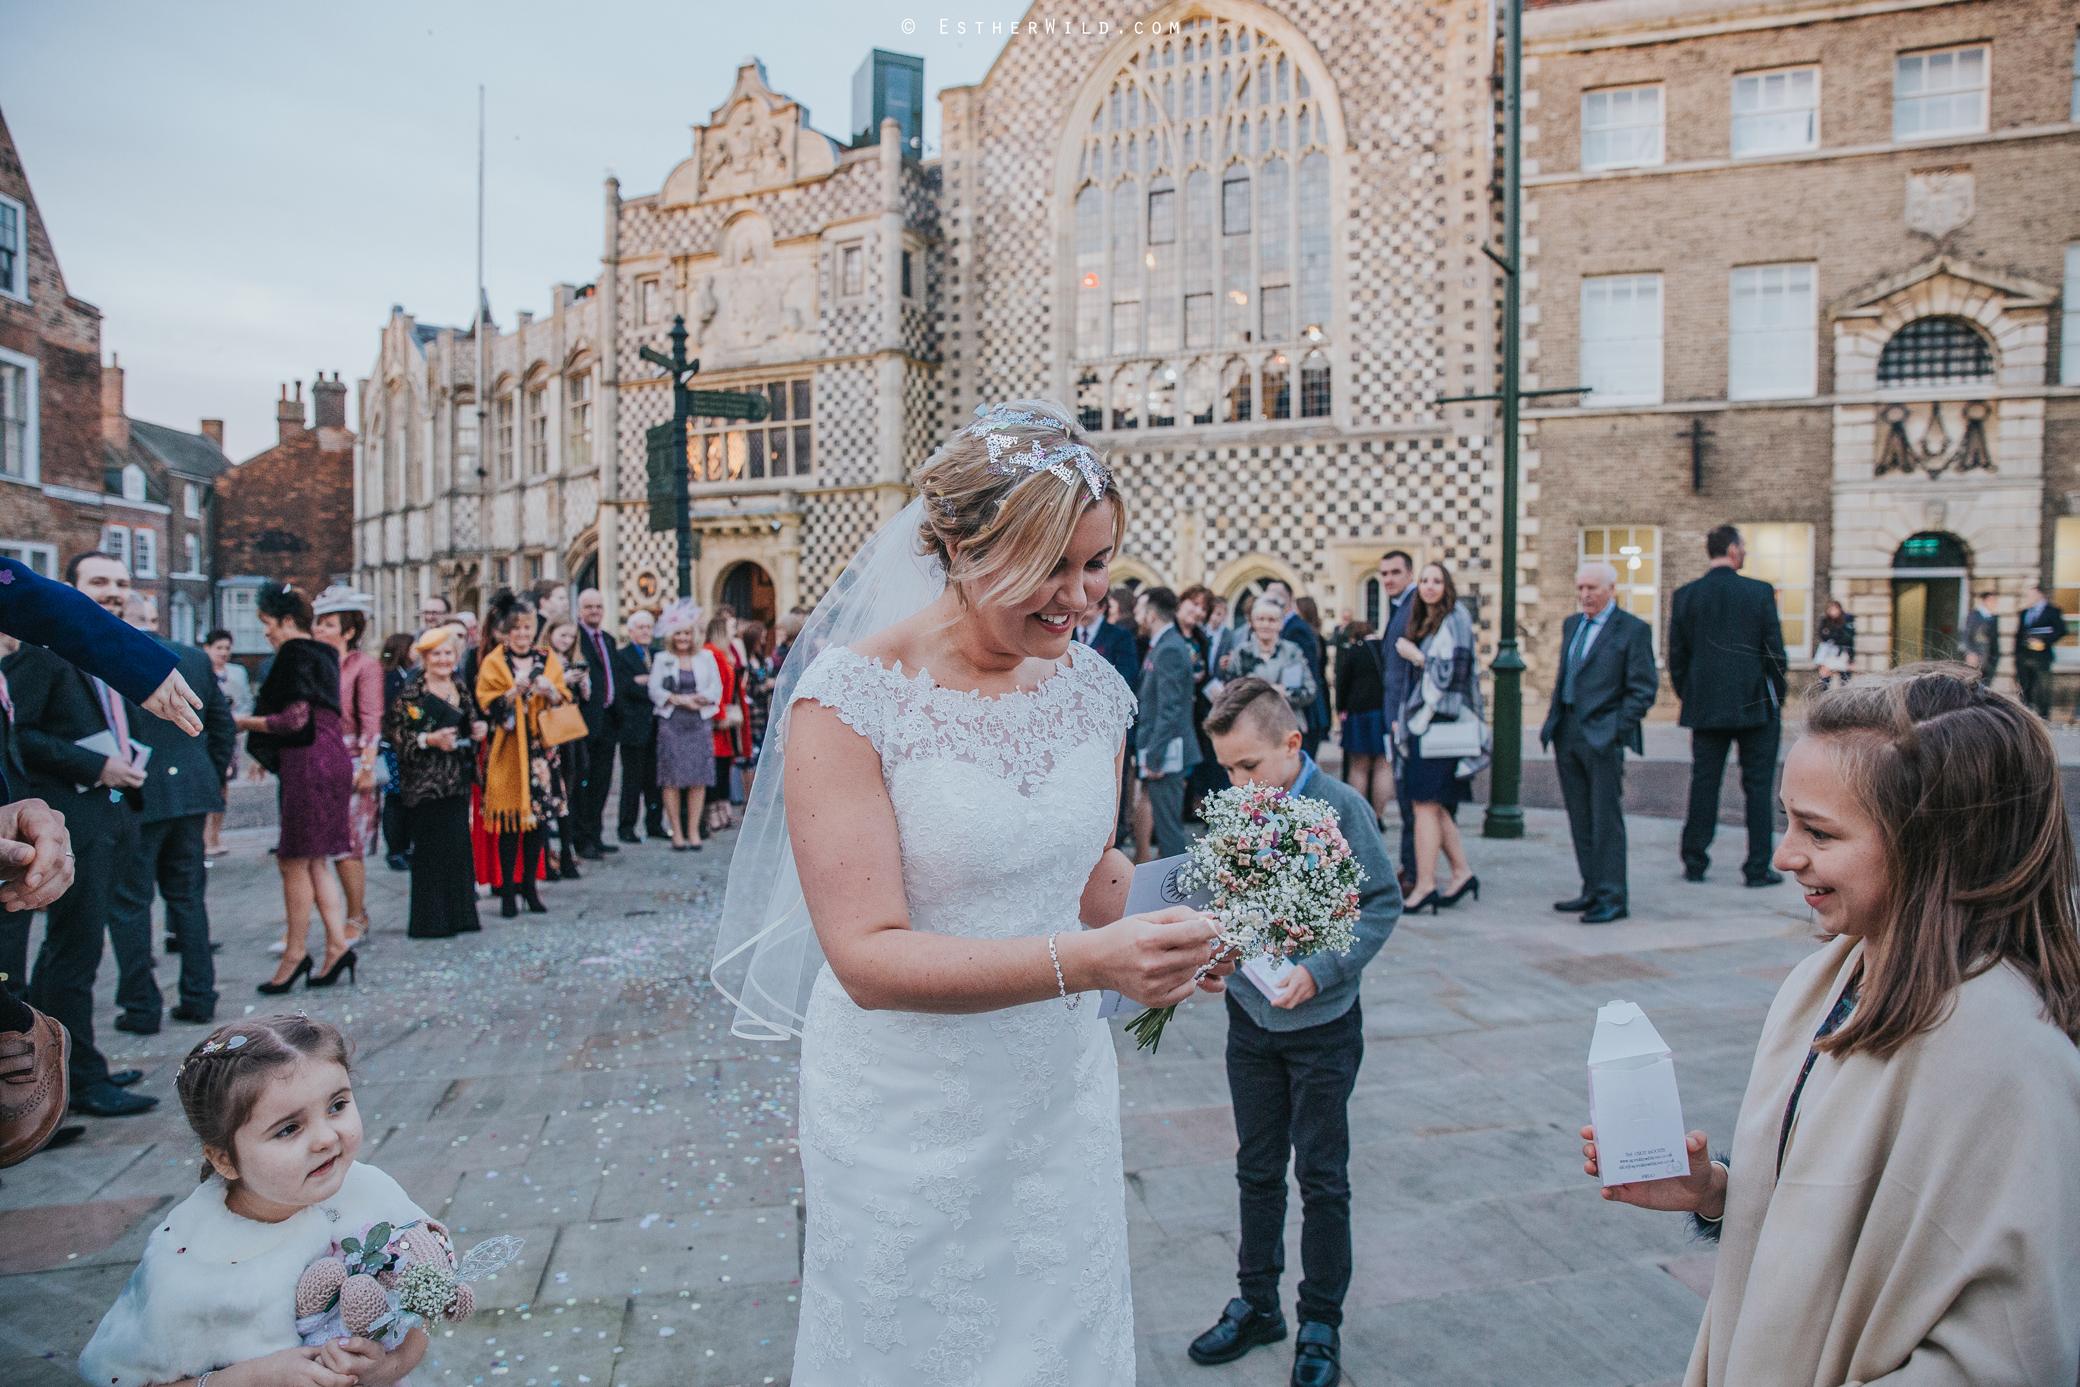 Wedding_Kings_Lynn_Town_Hall_Norfolk_Photographer_Esther_Wild_IMG_1260.jpg